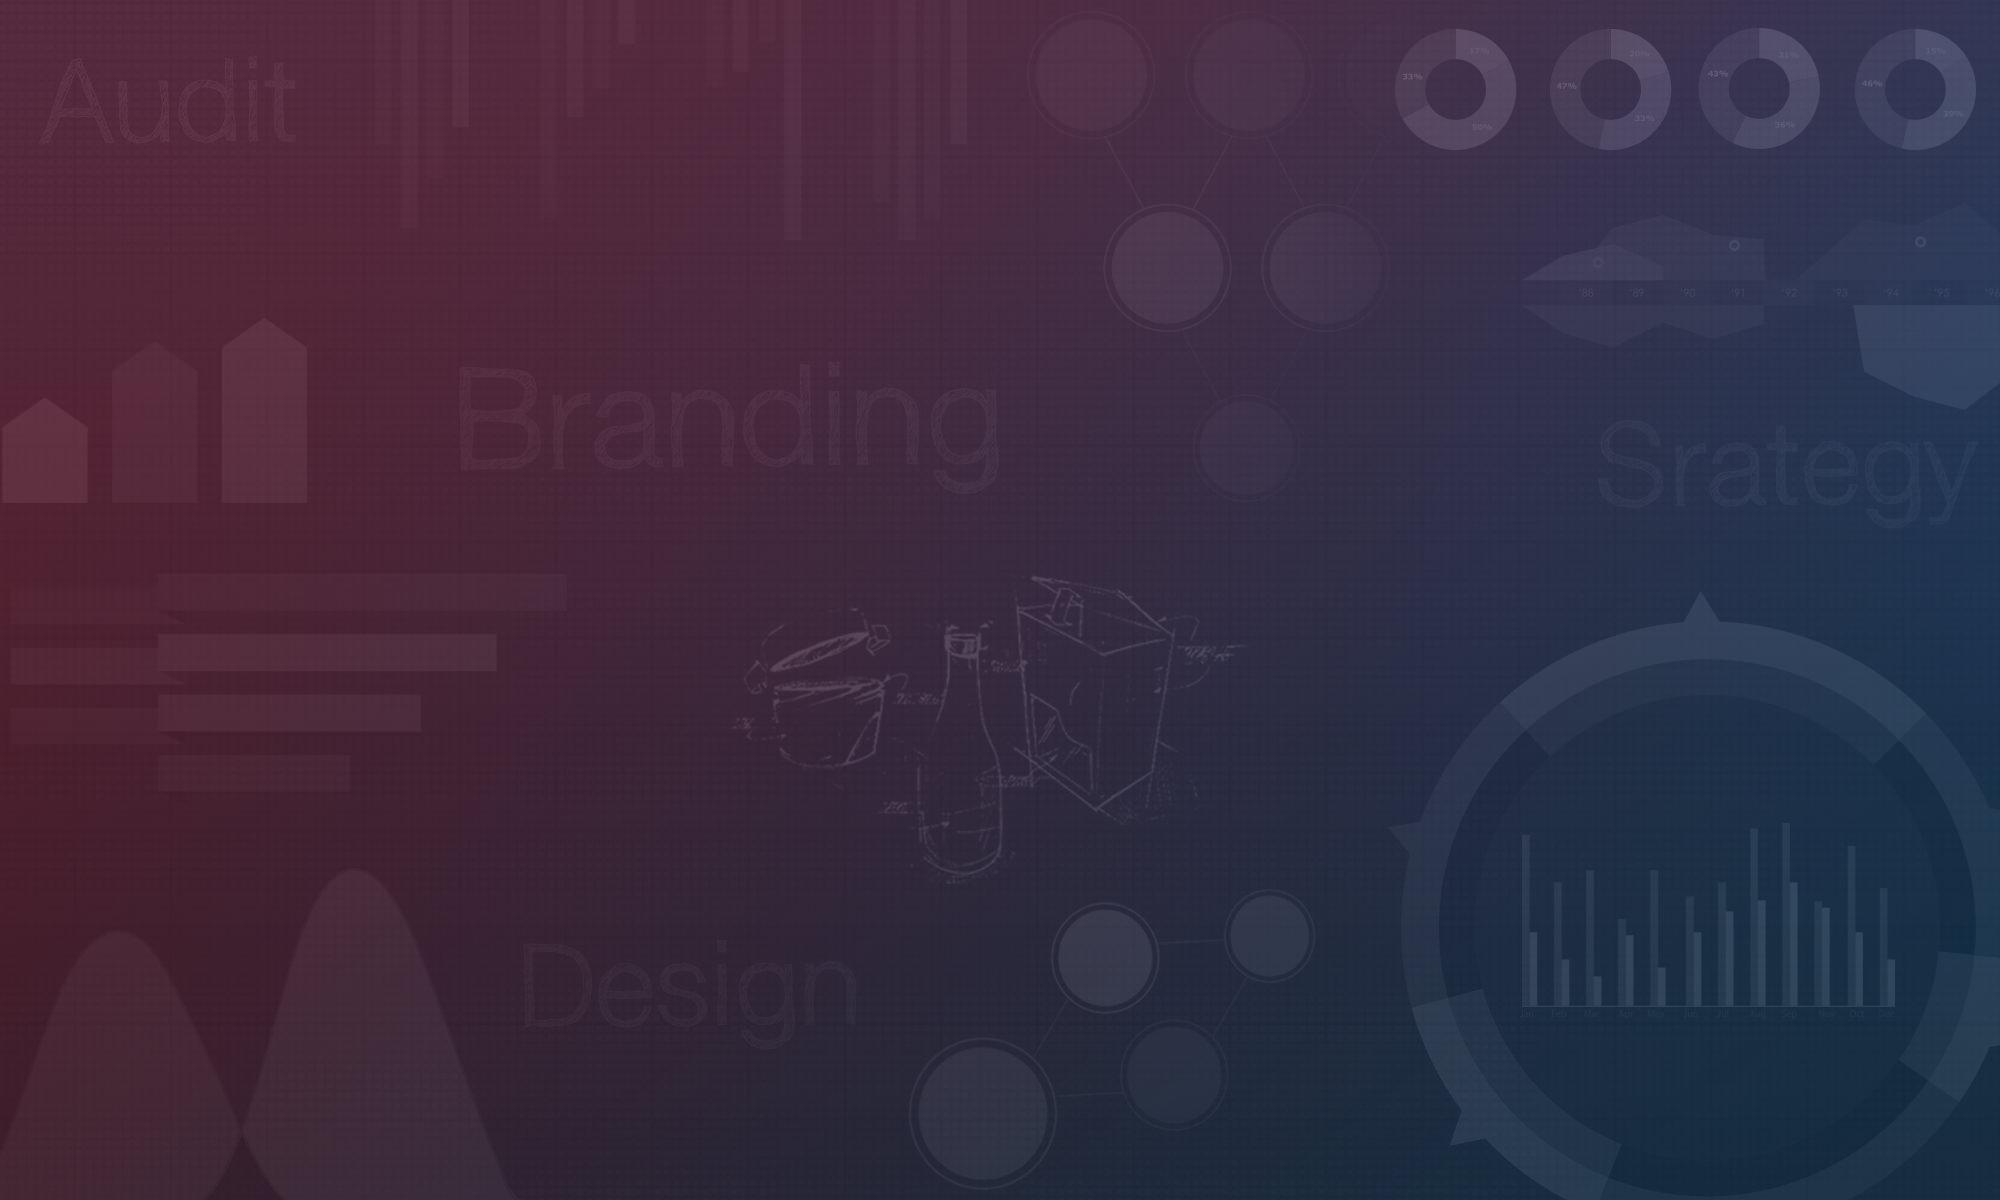 Yellow-Fishes-Branding-Agency-And-Design-Agency-Mumbai-and-singapore-branding-consultancy-Branding-Process